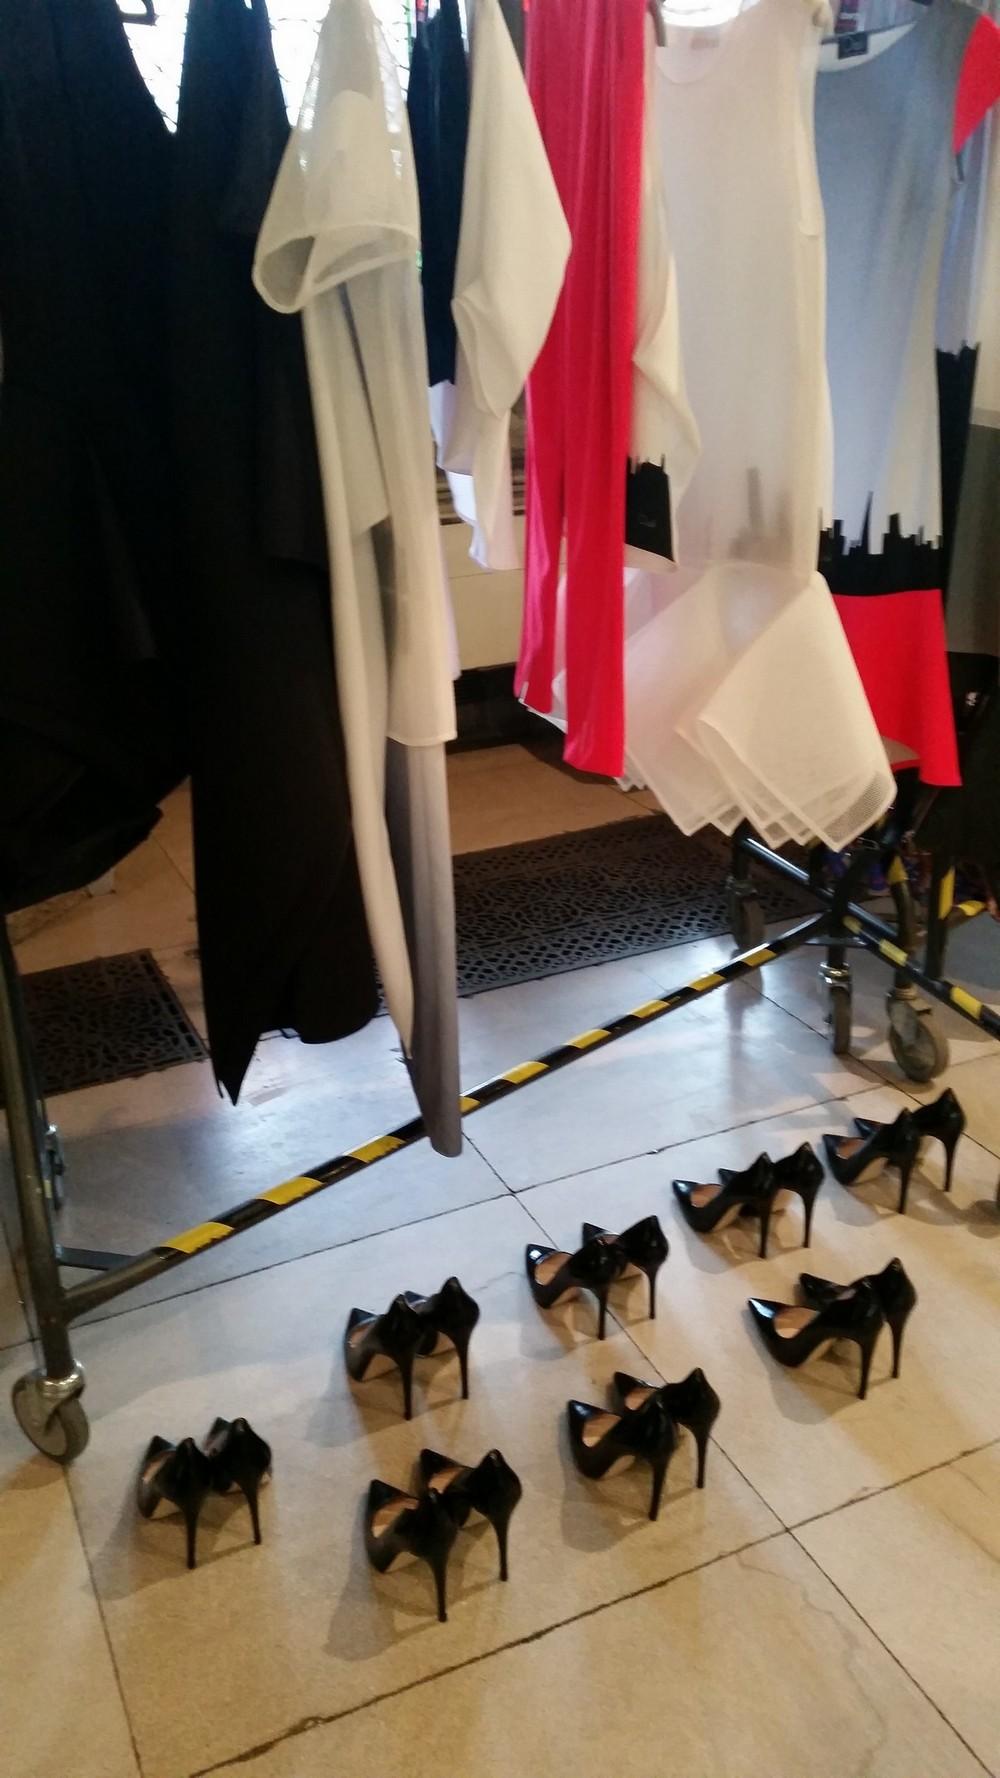 Lauros Dailidenienes prekes zenklo 'Daili' pristatymas Austrijoje Vienoje (14)